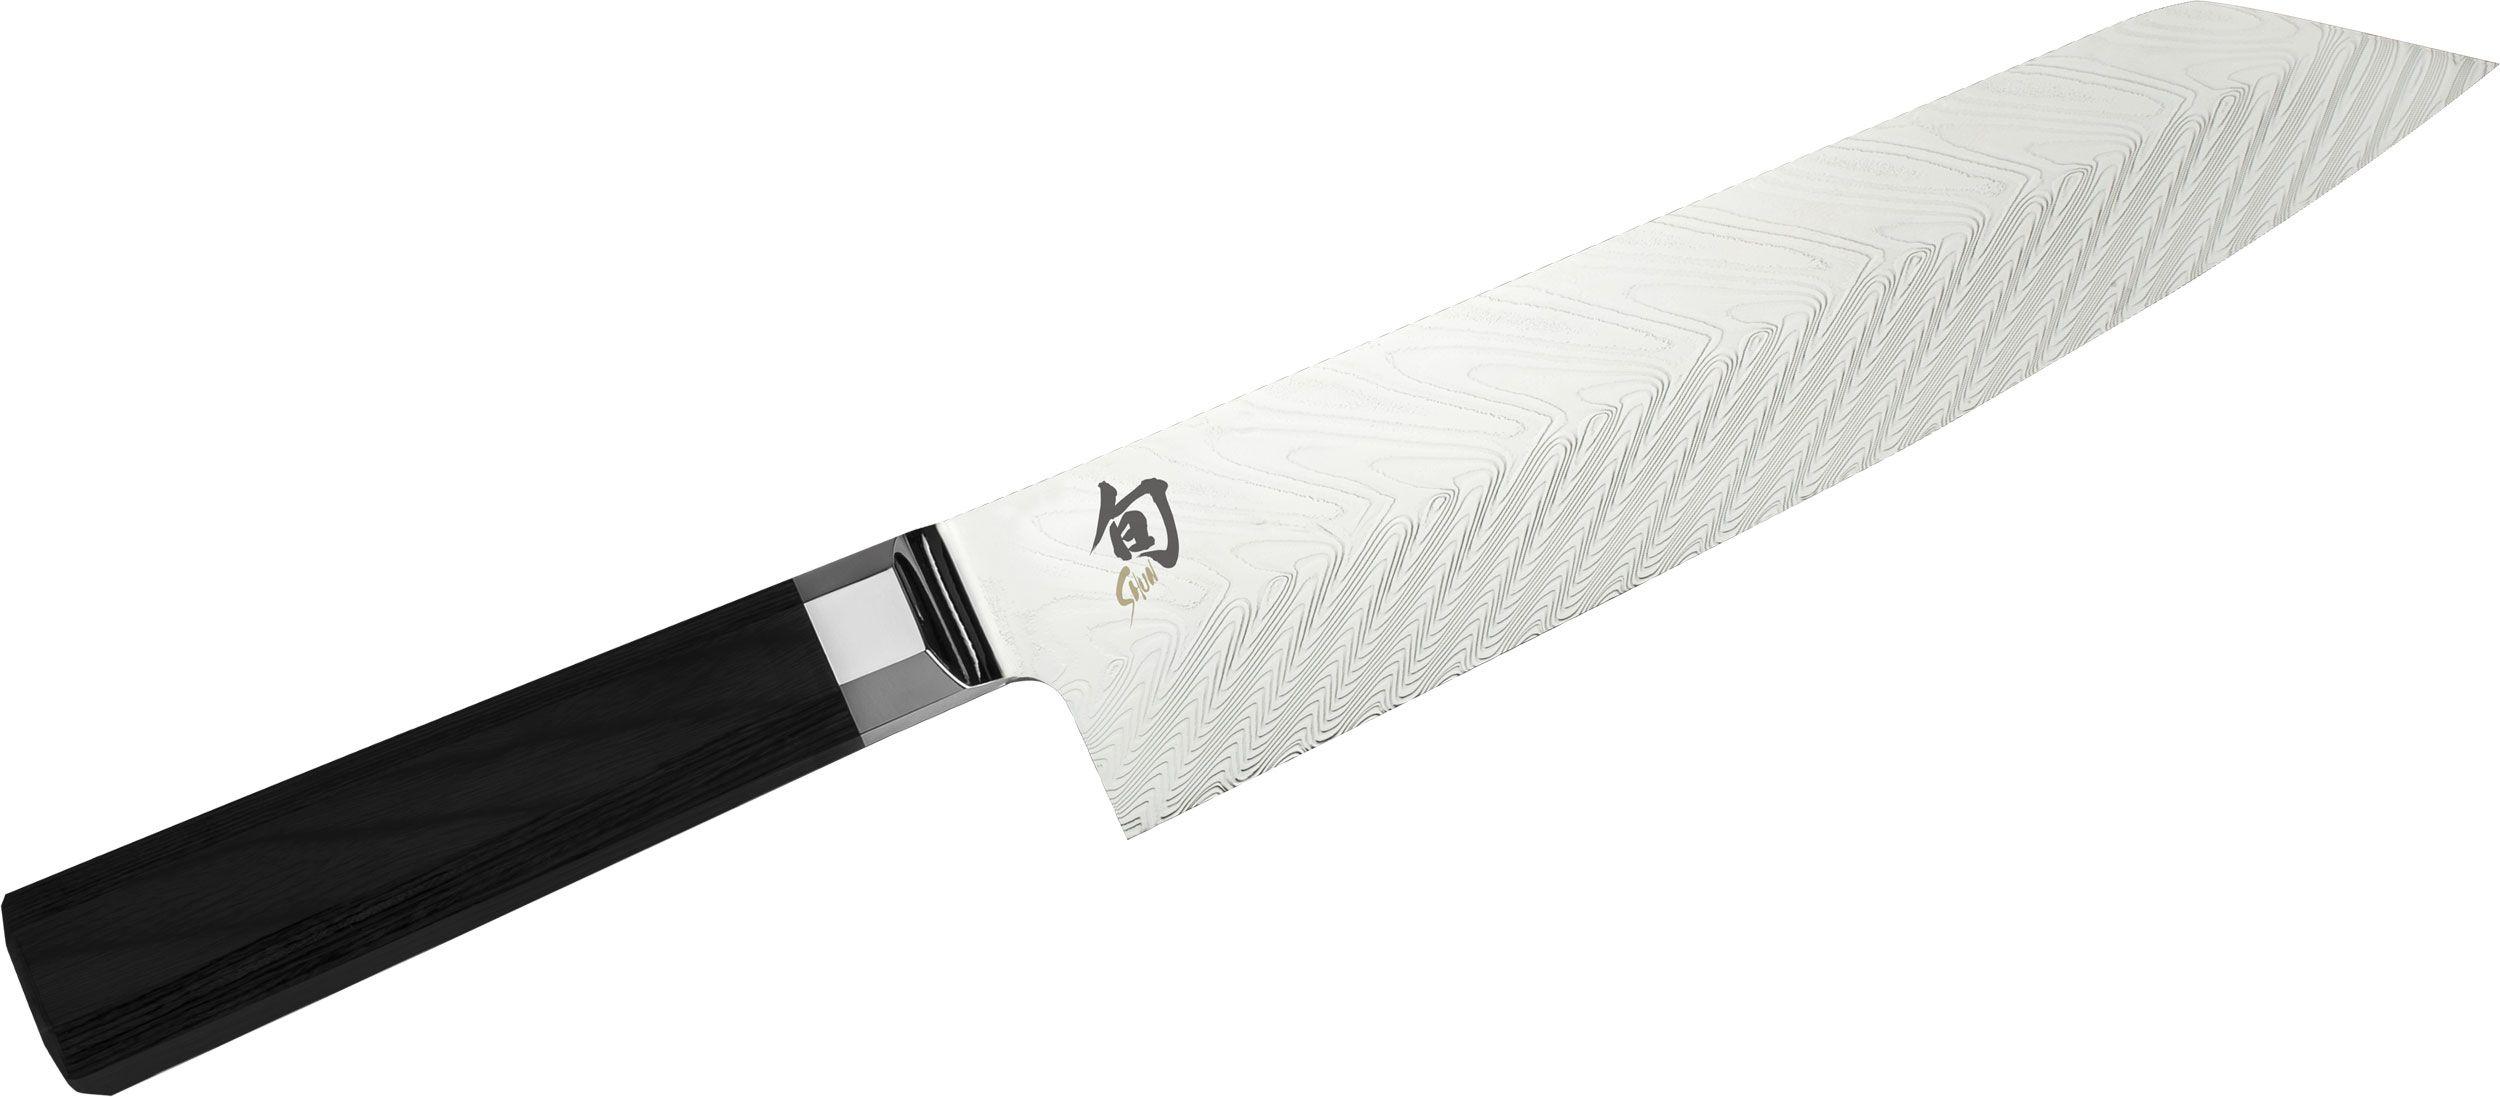 Shun VG0017 Dual Core Kiritsuke Knife 8 inch Damascus Blade, Ebony PakkaWood Handle